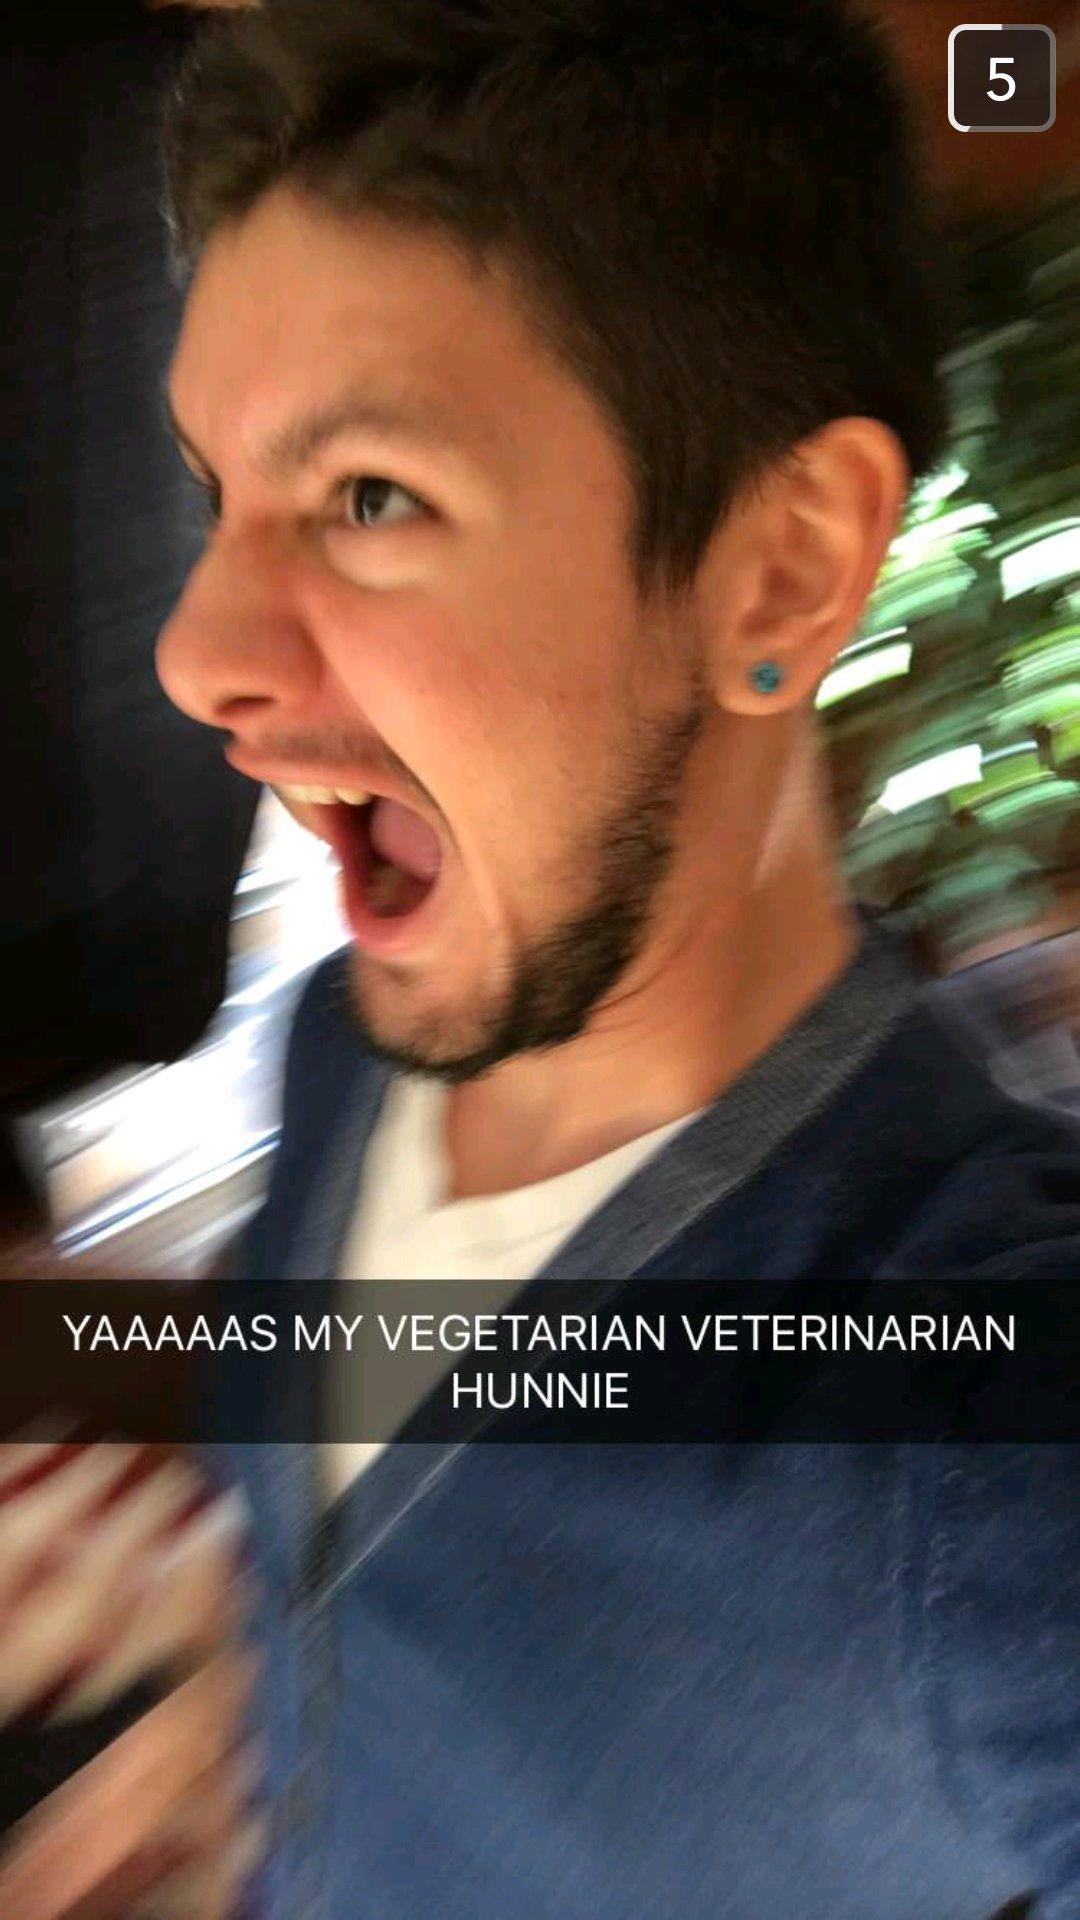 Vegetarian veterinarian hunnie™ https://t.co/rAjzSS0shj